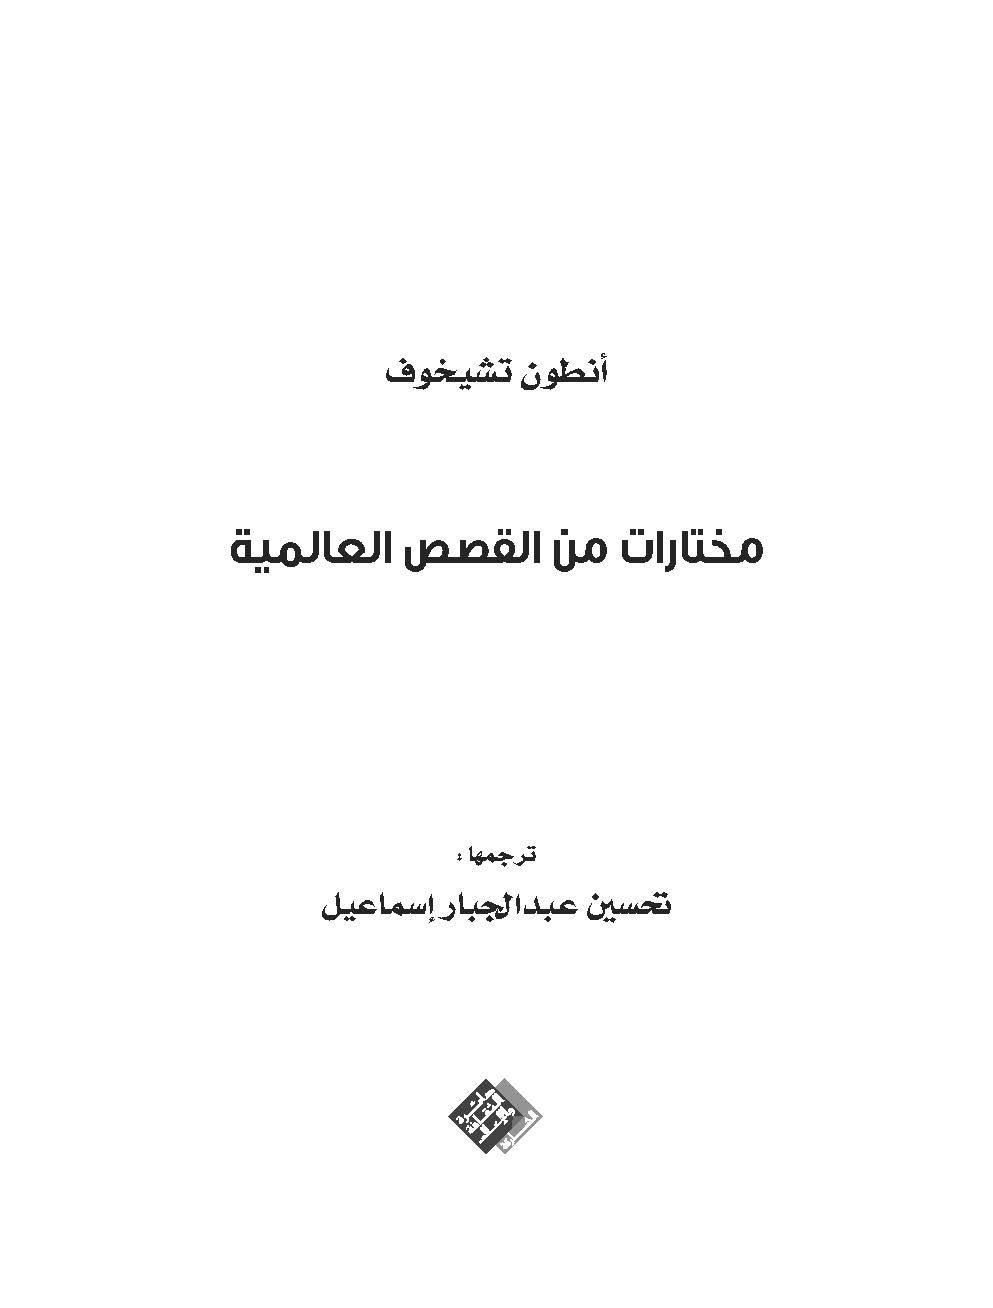 4a572 pagesde9 - مختارات من القصص العالمية pdf _ أنطون تشيخوف